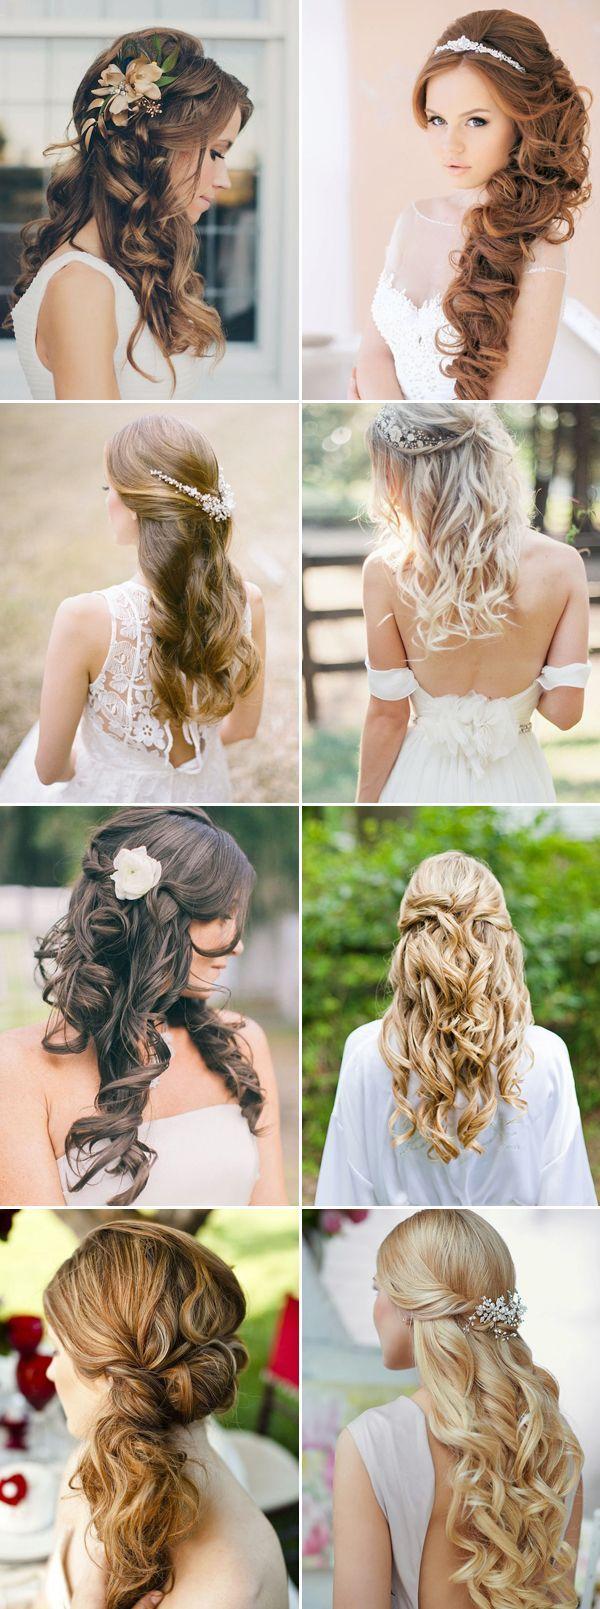 gorgeous half up half down hairstyles for brides wedding